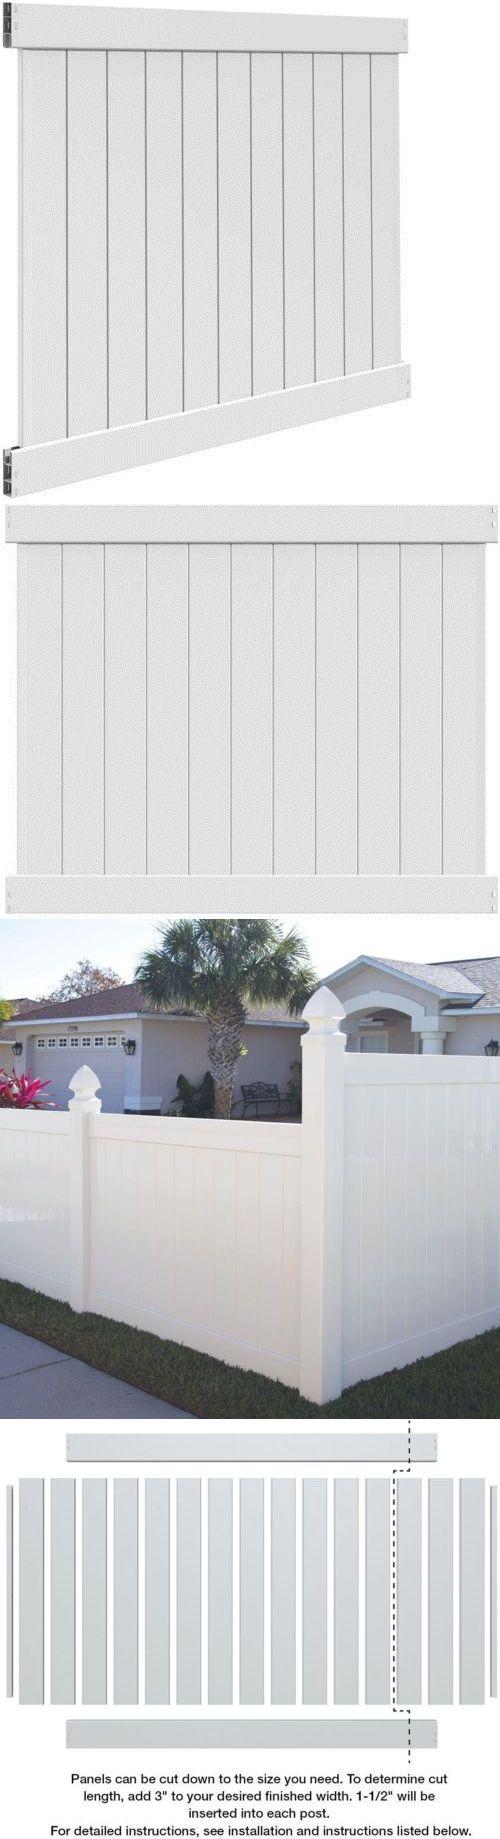 Fence Panels 139946: Veranda Vinyl Un Assembled Fence Panel Kit 5 Ft. H X 6 Ft. Diy Gate Lightweight -> BUY IT NOW ONLY: $81.16 on eBay!